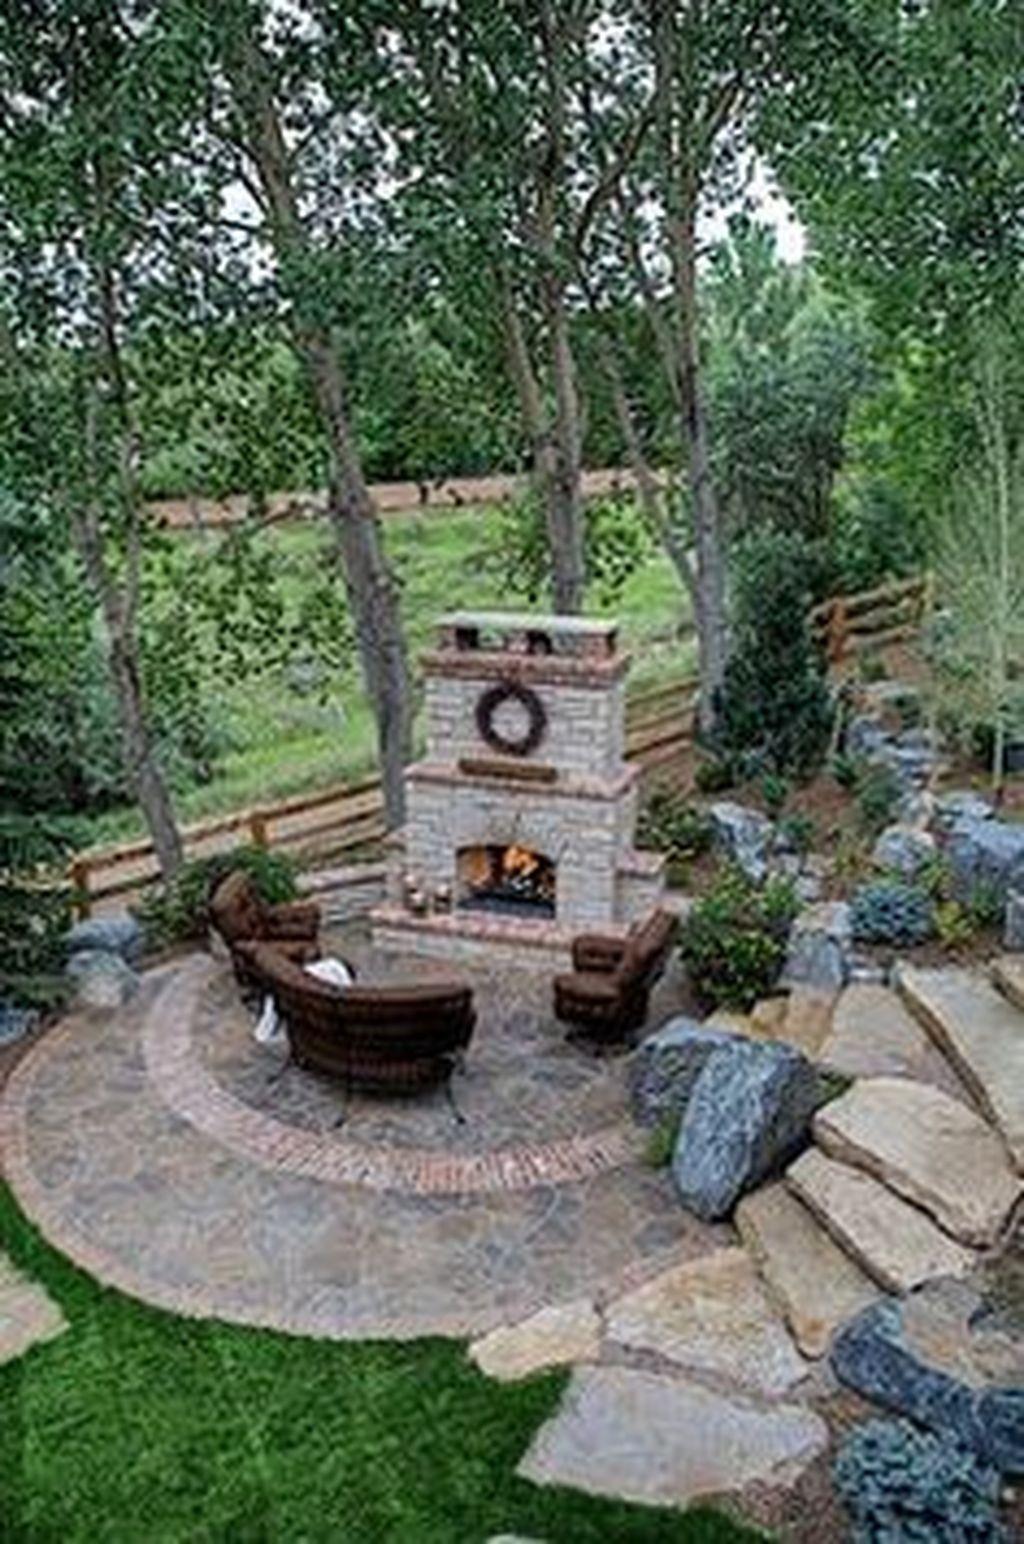 36 Cozy Rustic Patio Design Ideas Home Interior And Design Backyard Backyard Landscaping Stone Patio Designs Backyard landscaping ideas with fireplace